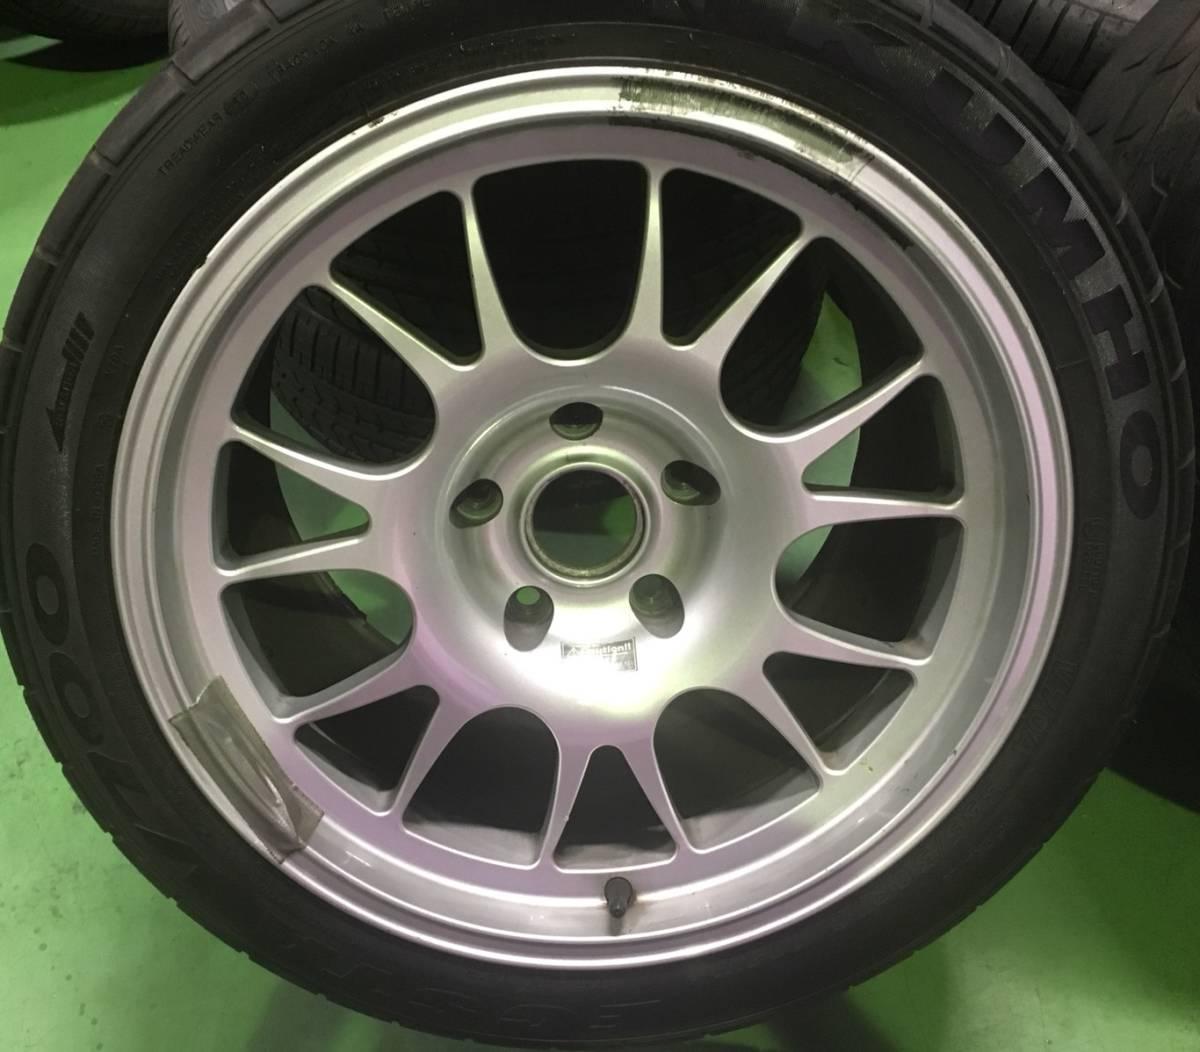 BBS製 ポルシェ 911 996 GT2用 18インチ マグネシウムホイール 4本SET 特注品 (207)_画像4